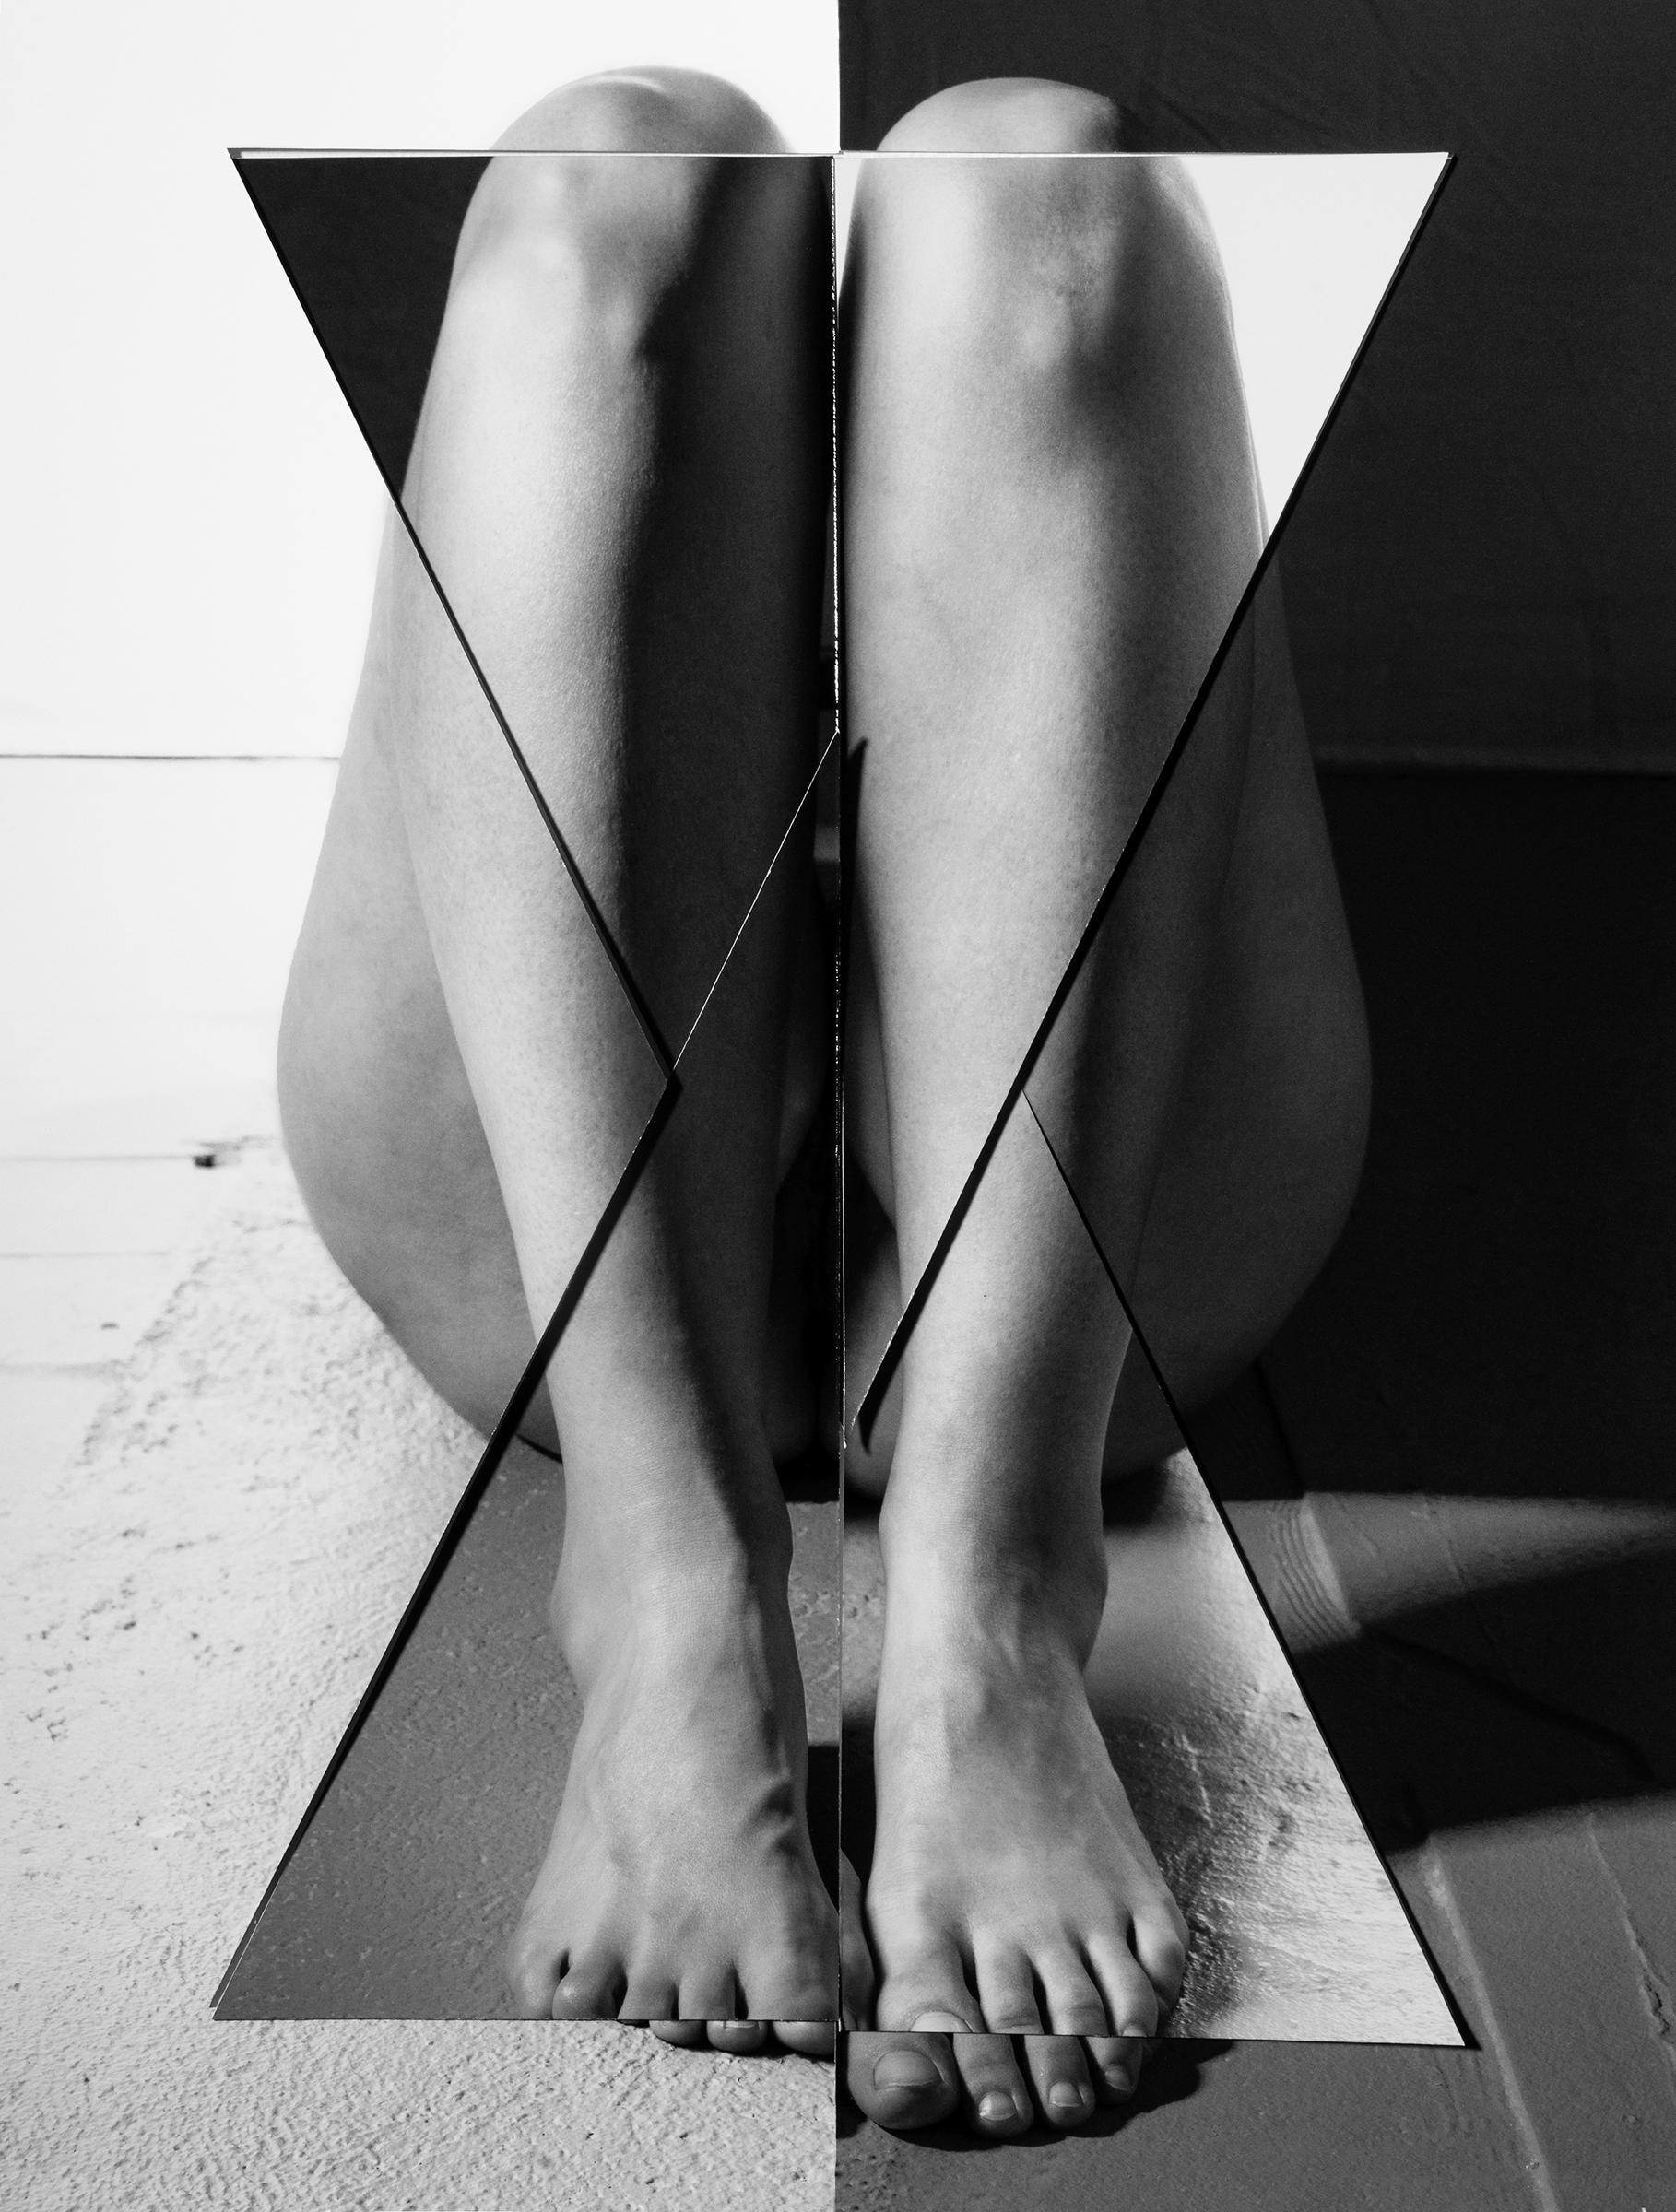 Kim Hoeckele, Block-like Figure Invoking Birth, 2018. Courtesy of the artist.